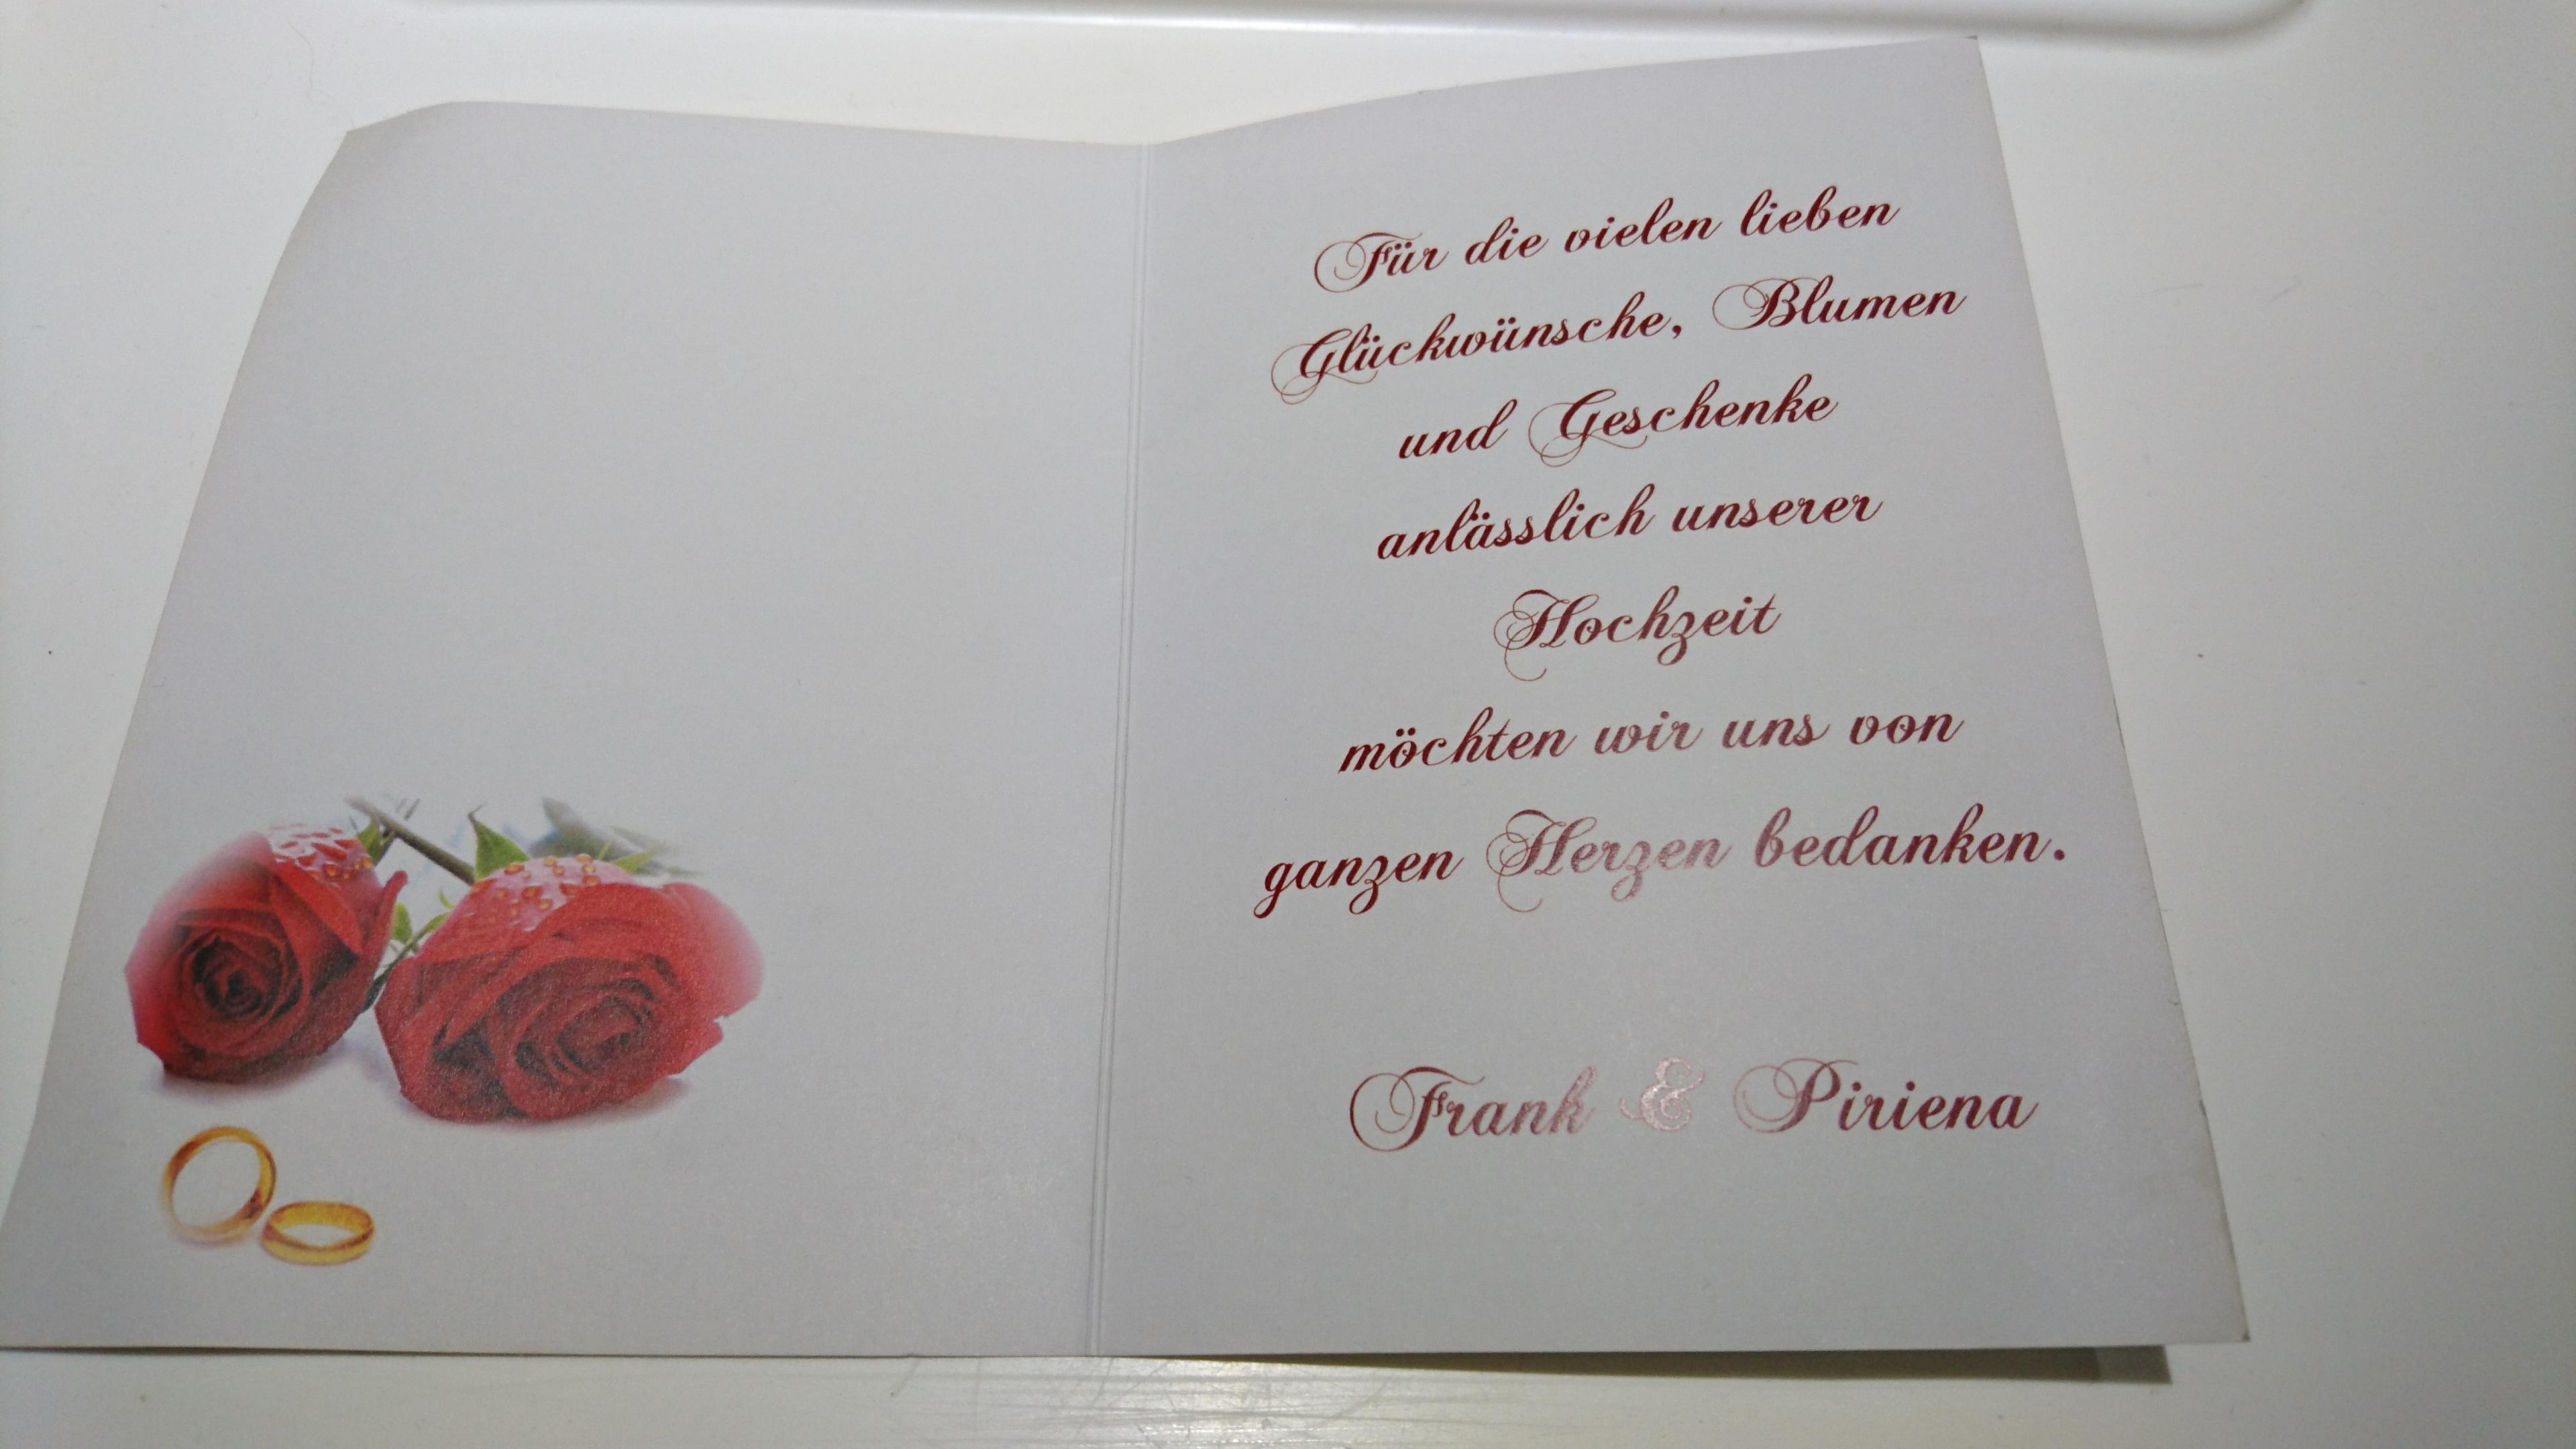 Hochzeit Piriena & Frank